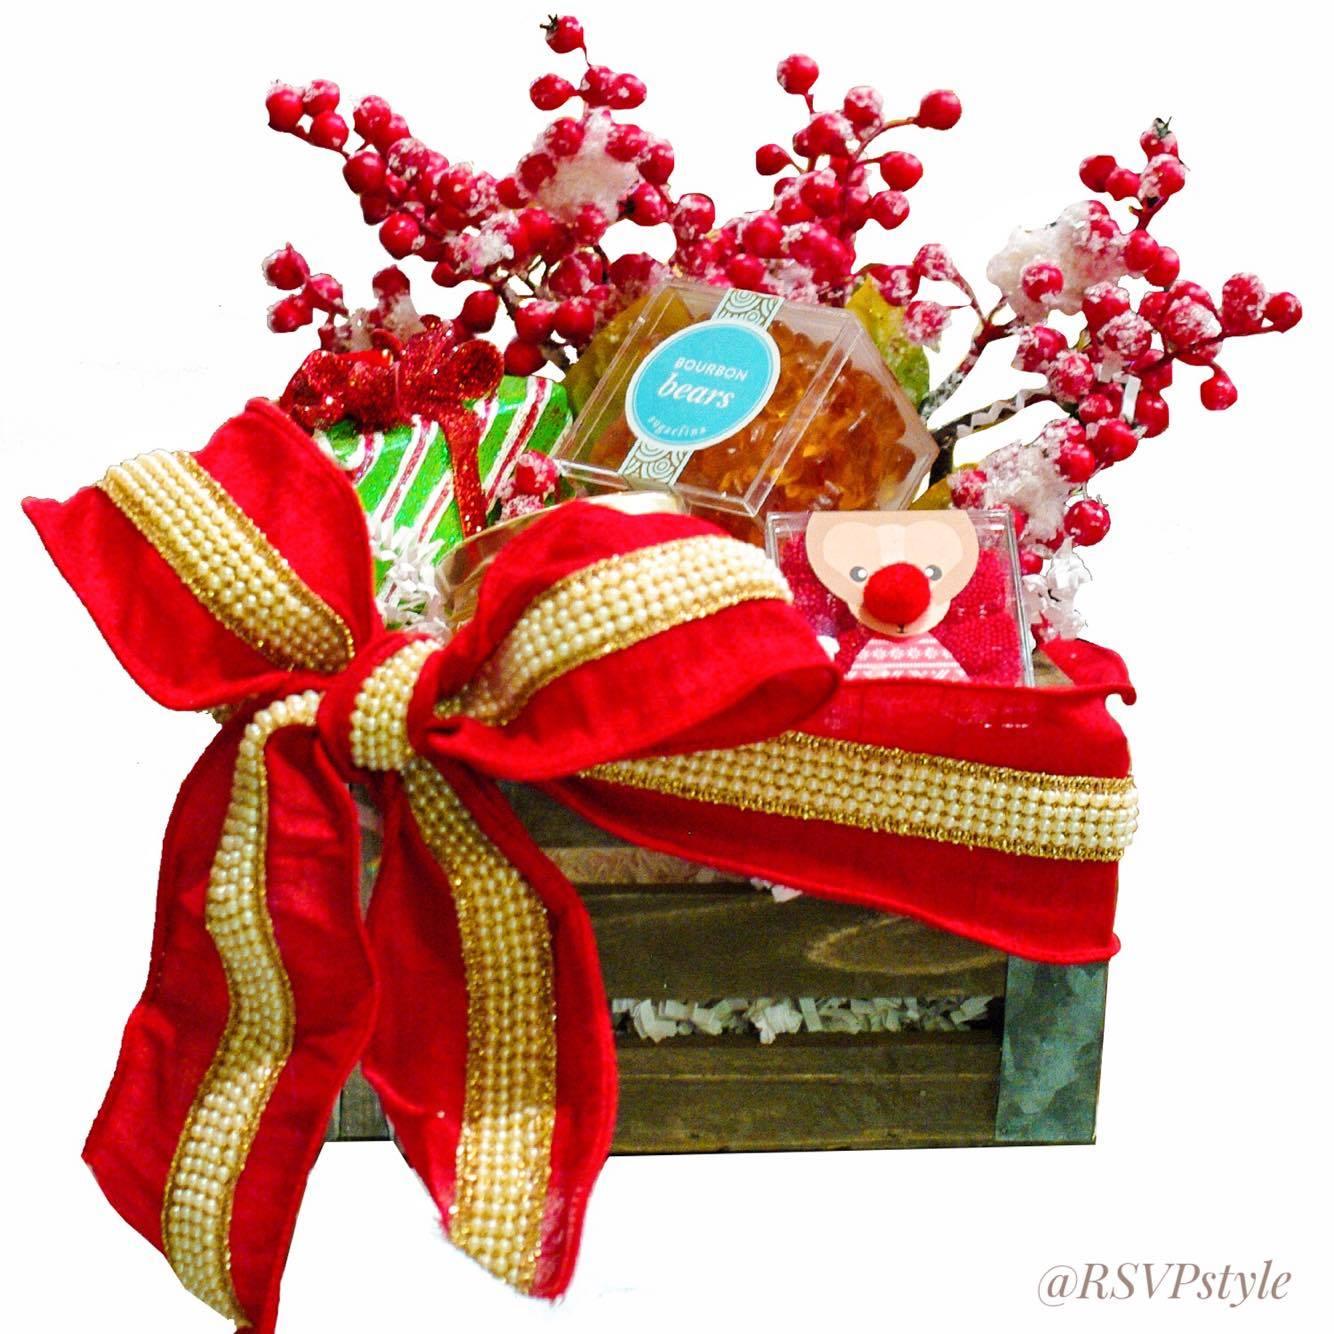 Christmas Berries Gift Basket